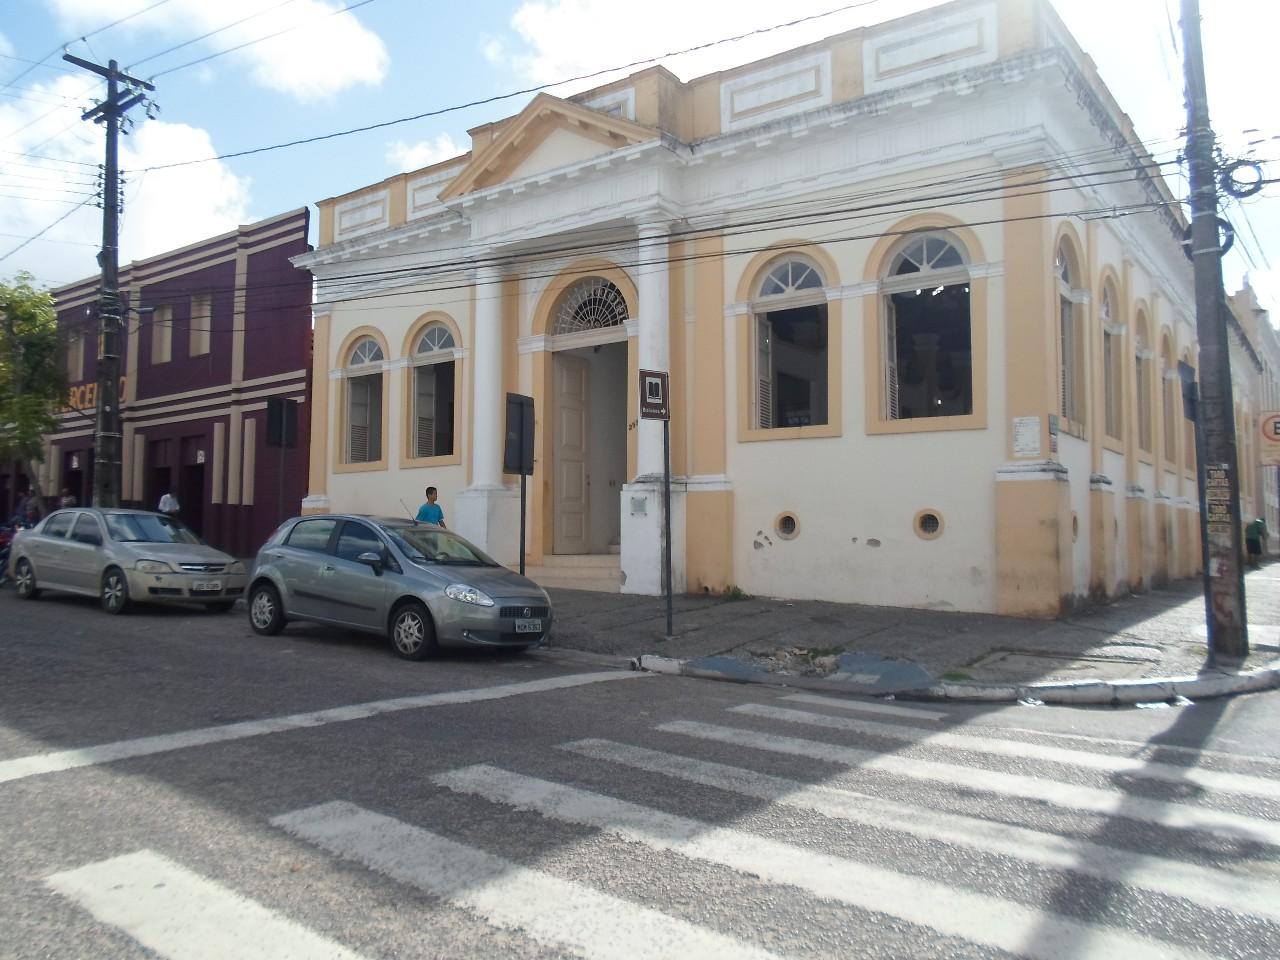 Biblioteca Pública Estadual da Paraíba. Foto: biblioteca-publica-estadual-pb.webnode.com.